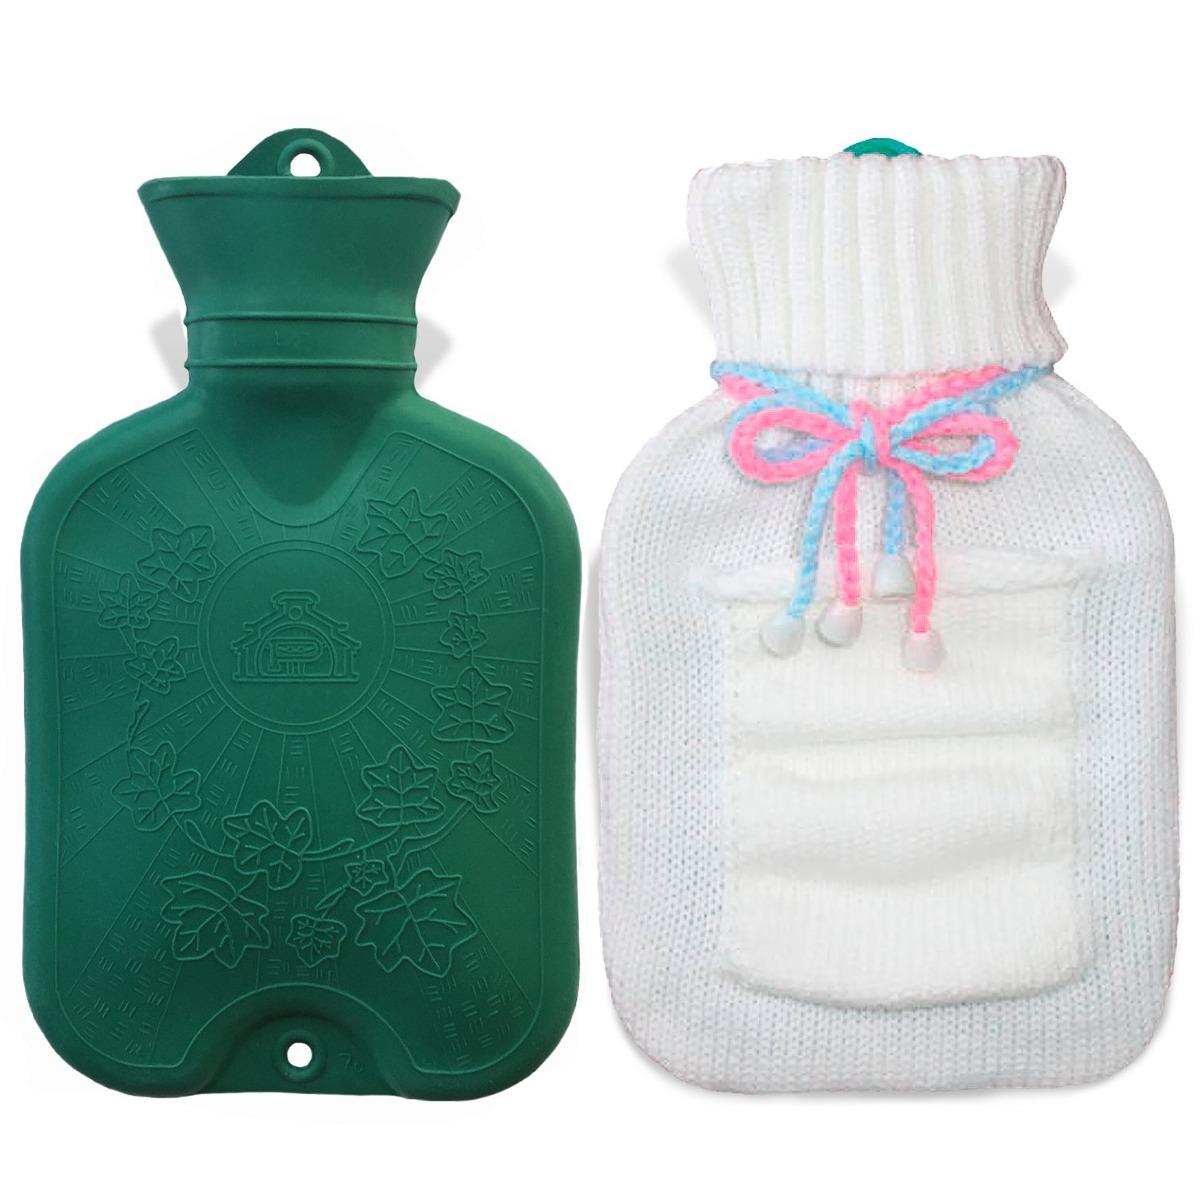 Botella De Agua Caliente Clásica Ufeelgood 214fa04a8ce